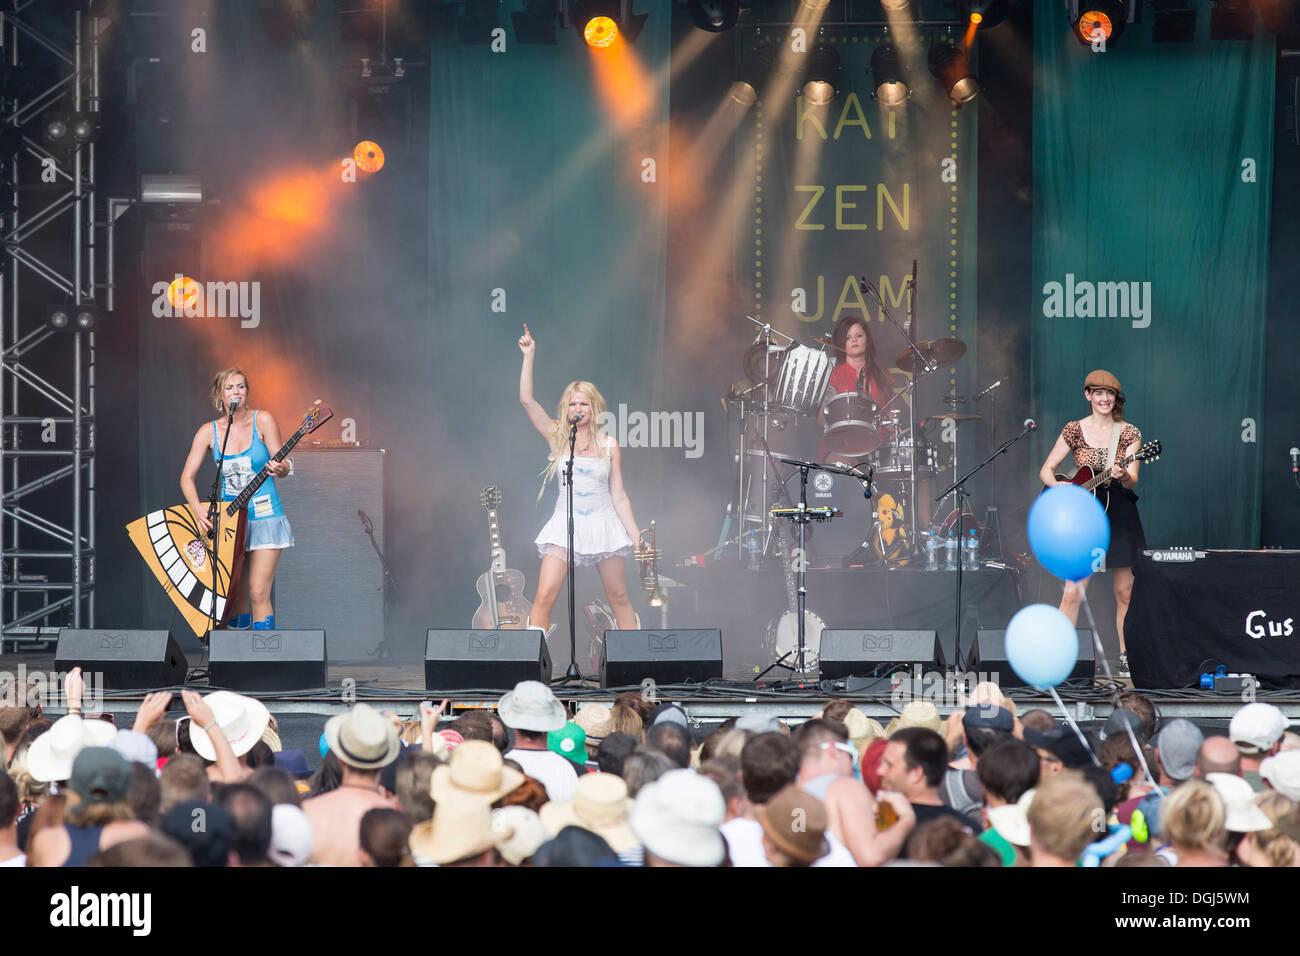 Norwegian girl band Katzenjammer performing live at Heitere Open Air in Zofingen, Aargau, Switzerland, Europe - Stock Image